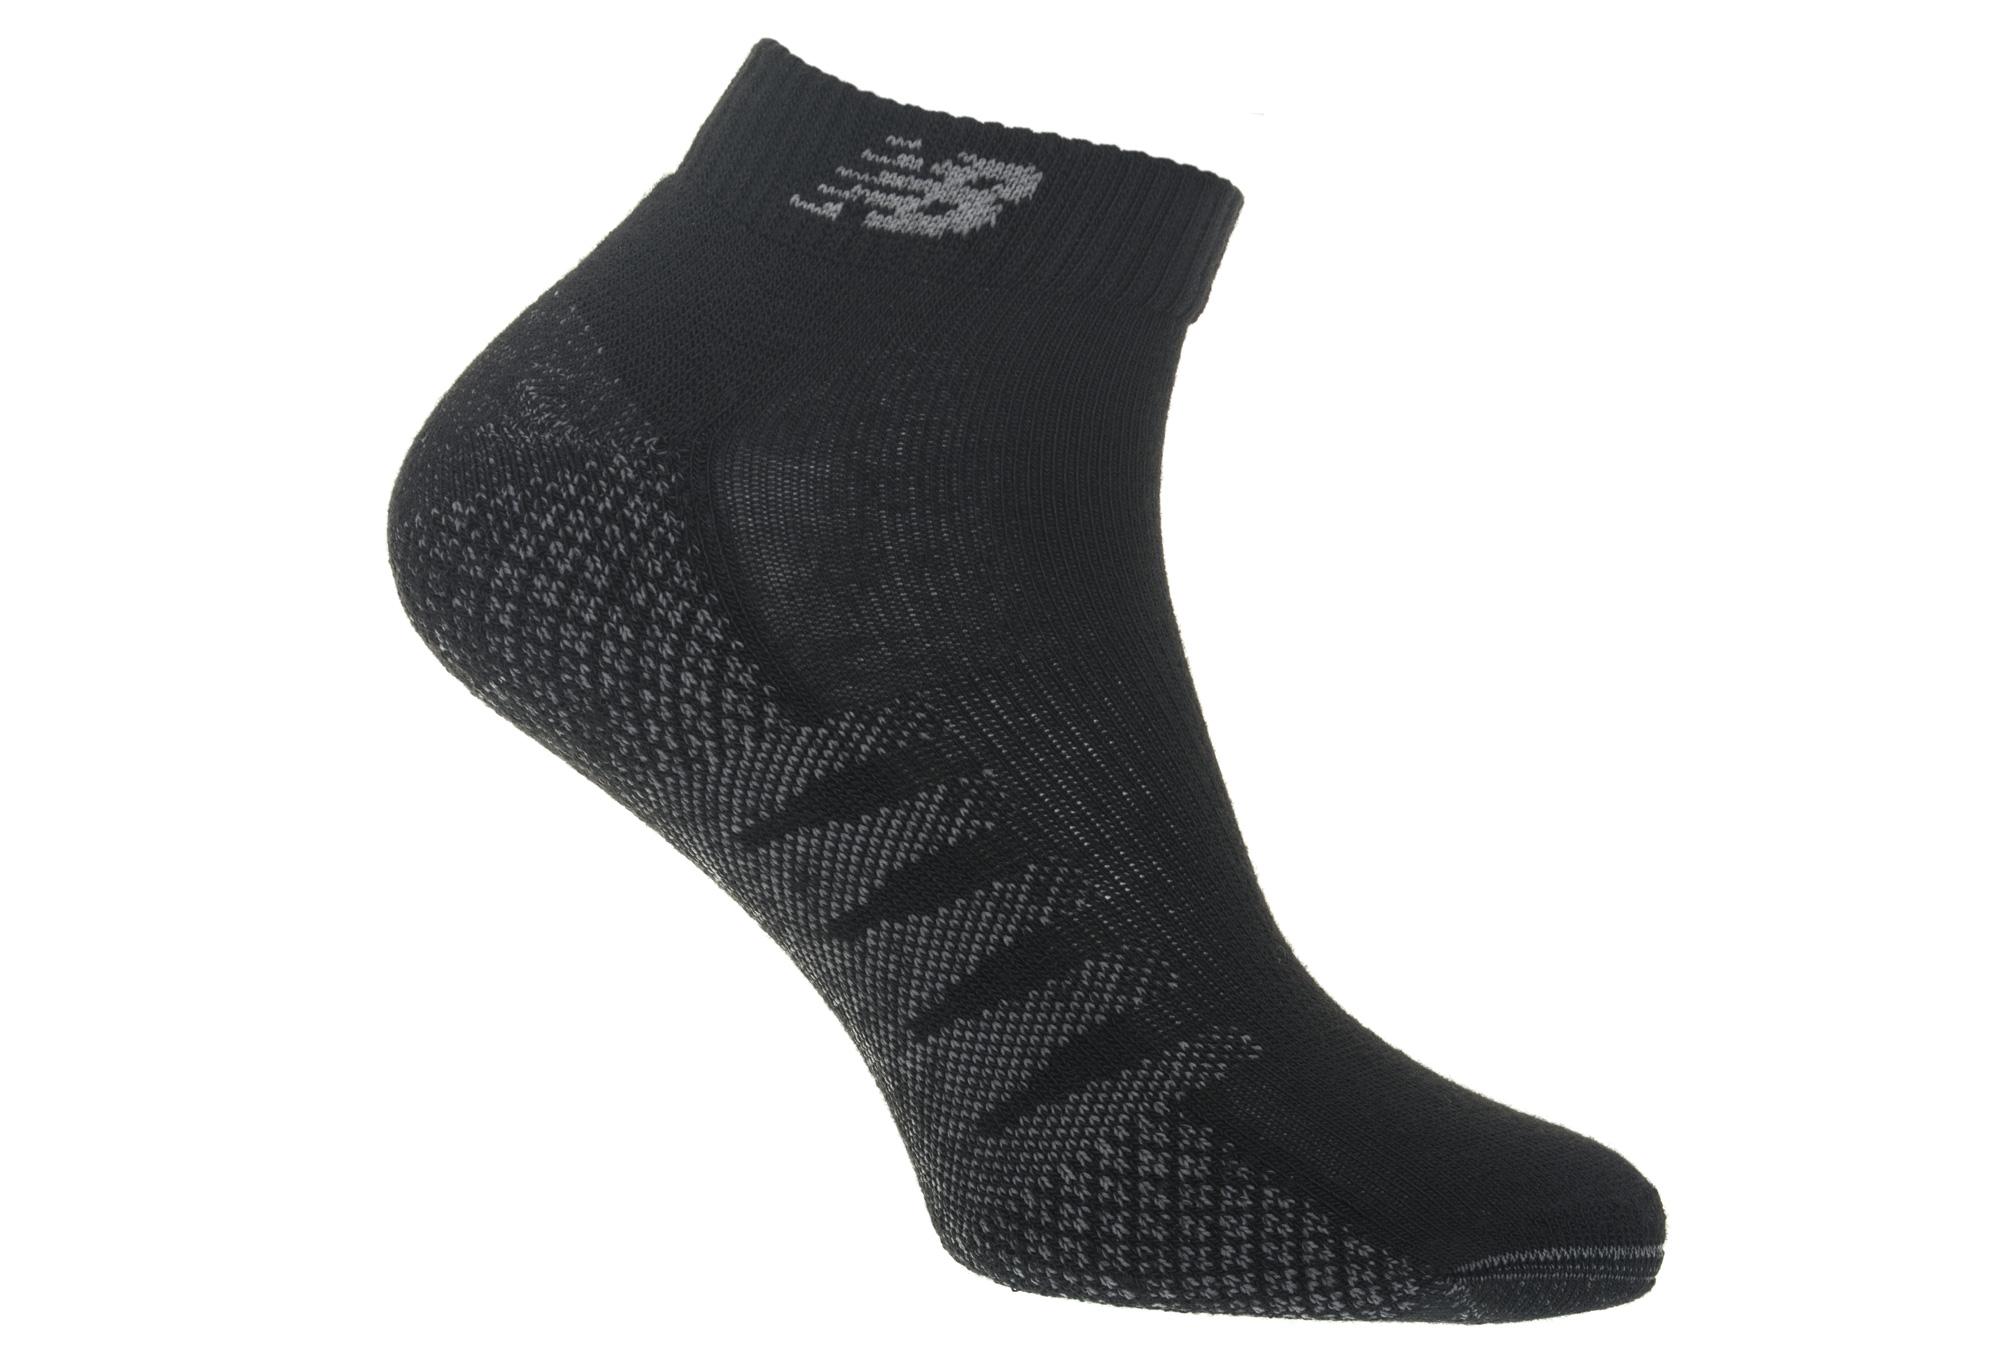 chaussettes femme new balance n7020 230 noir. Black Bedroom Furniture Sets. Home Design Ideas